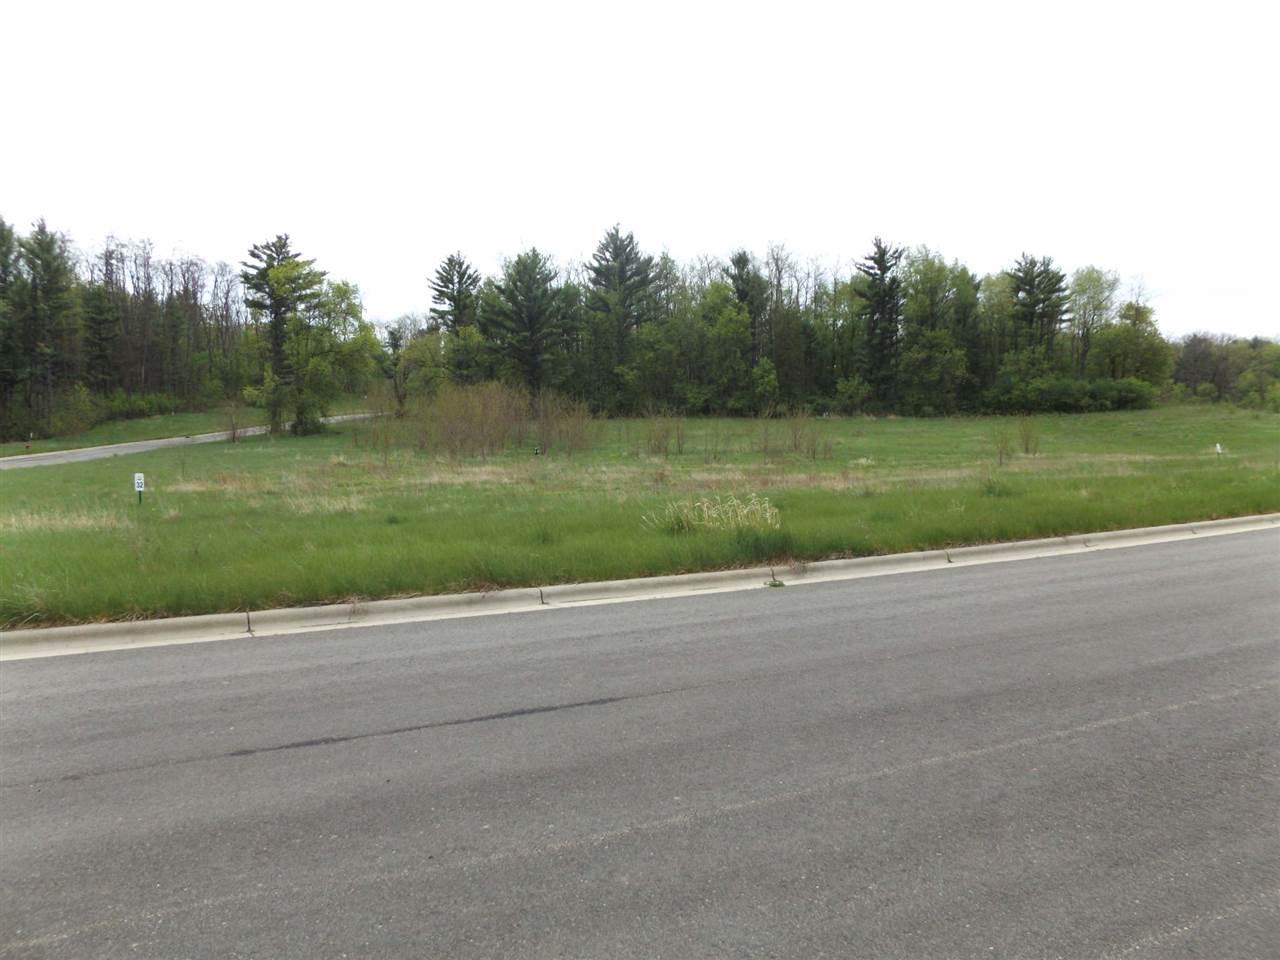 0 Deerwood Tr, Wisconsin Dells, WI 53965